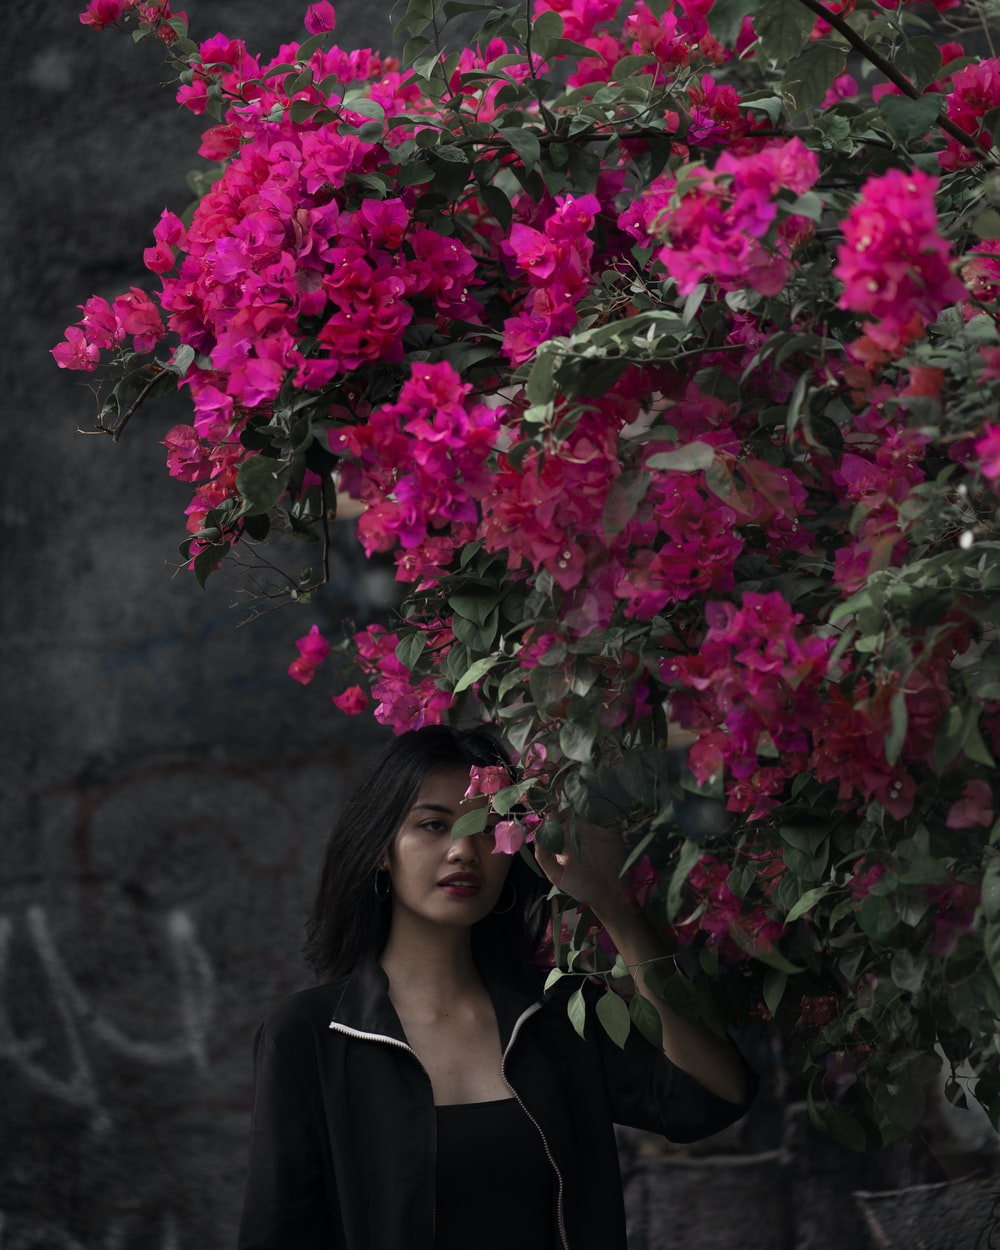 woman in black blazer holding pink flowers